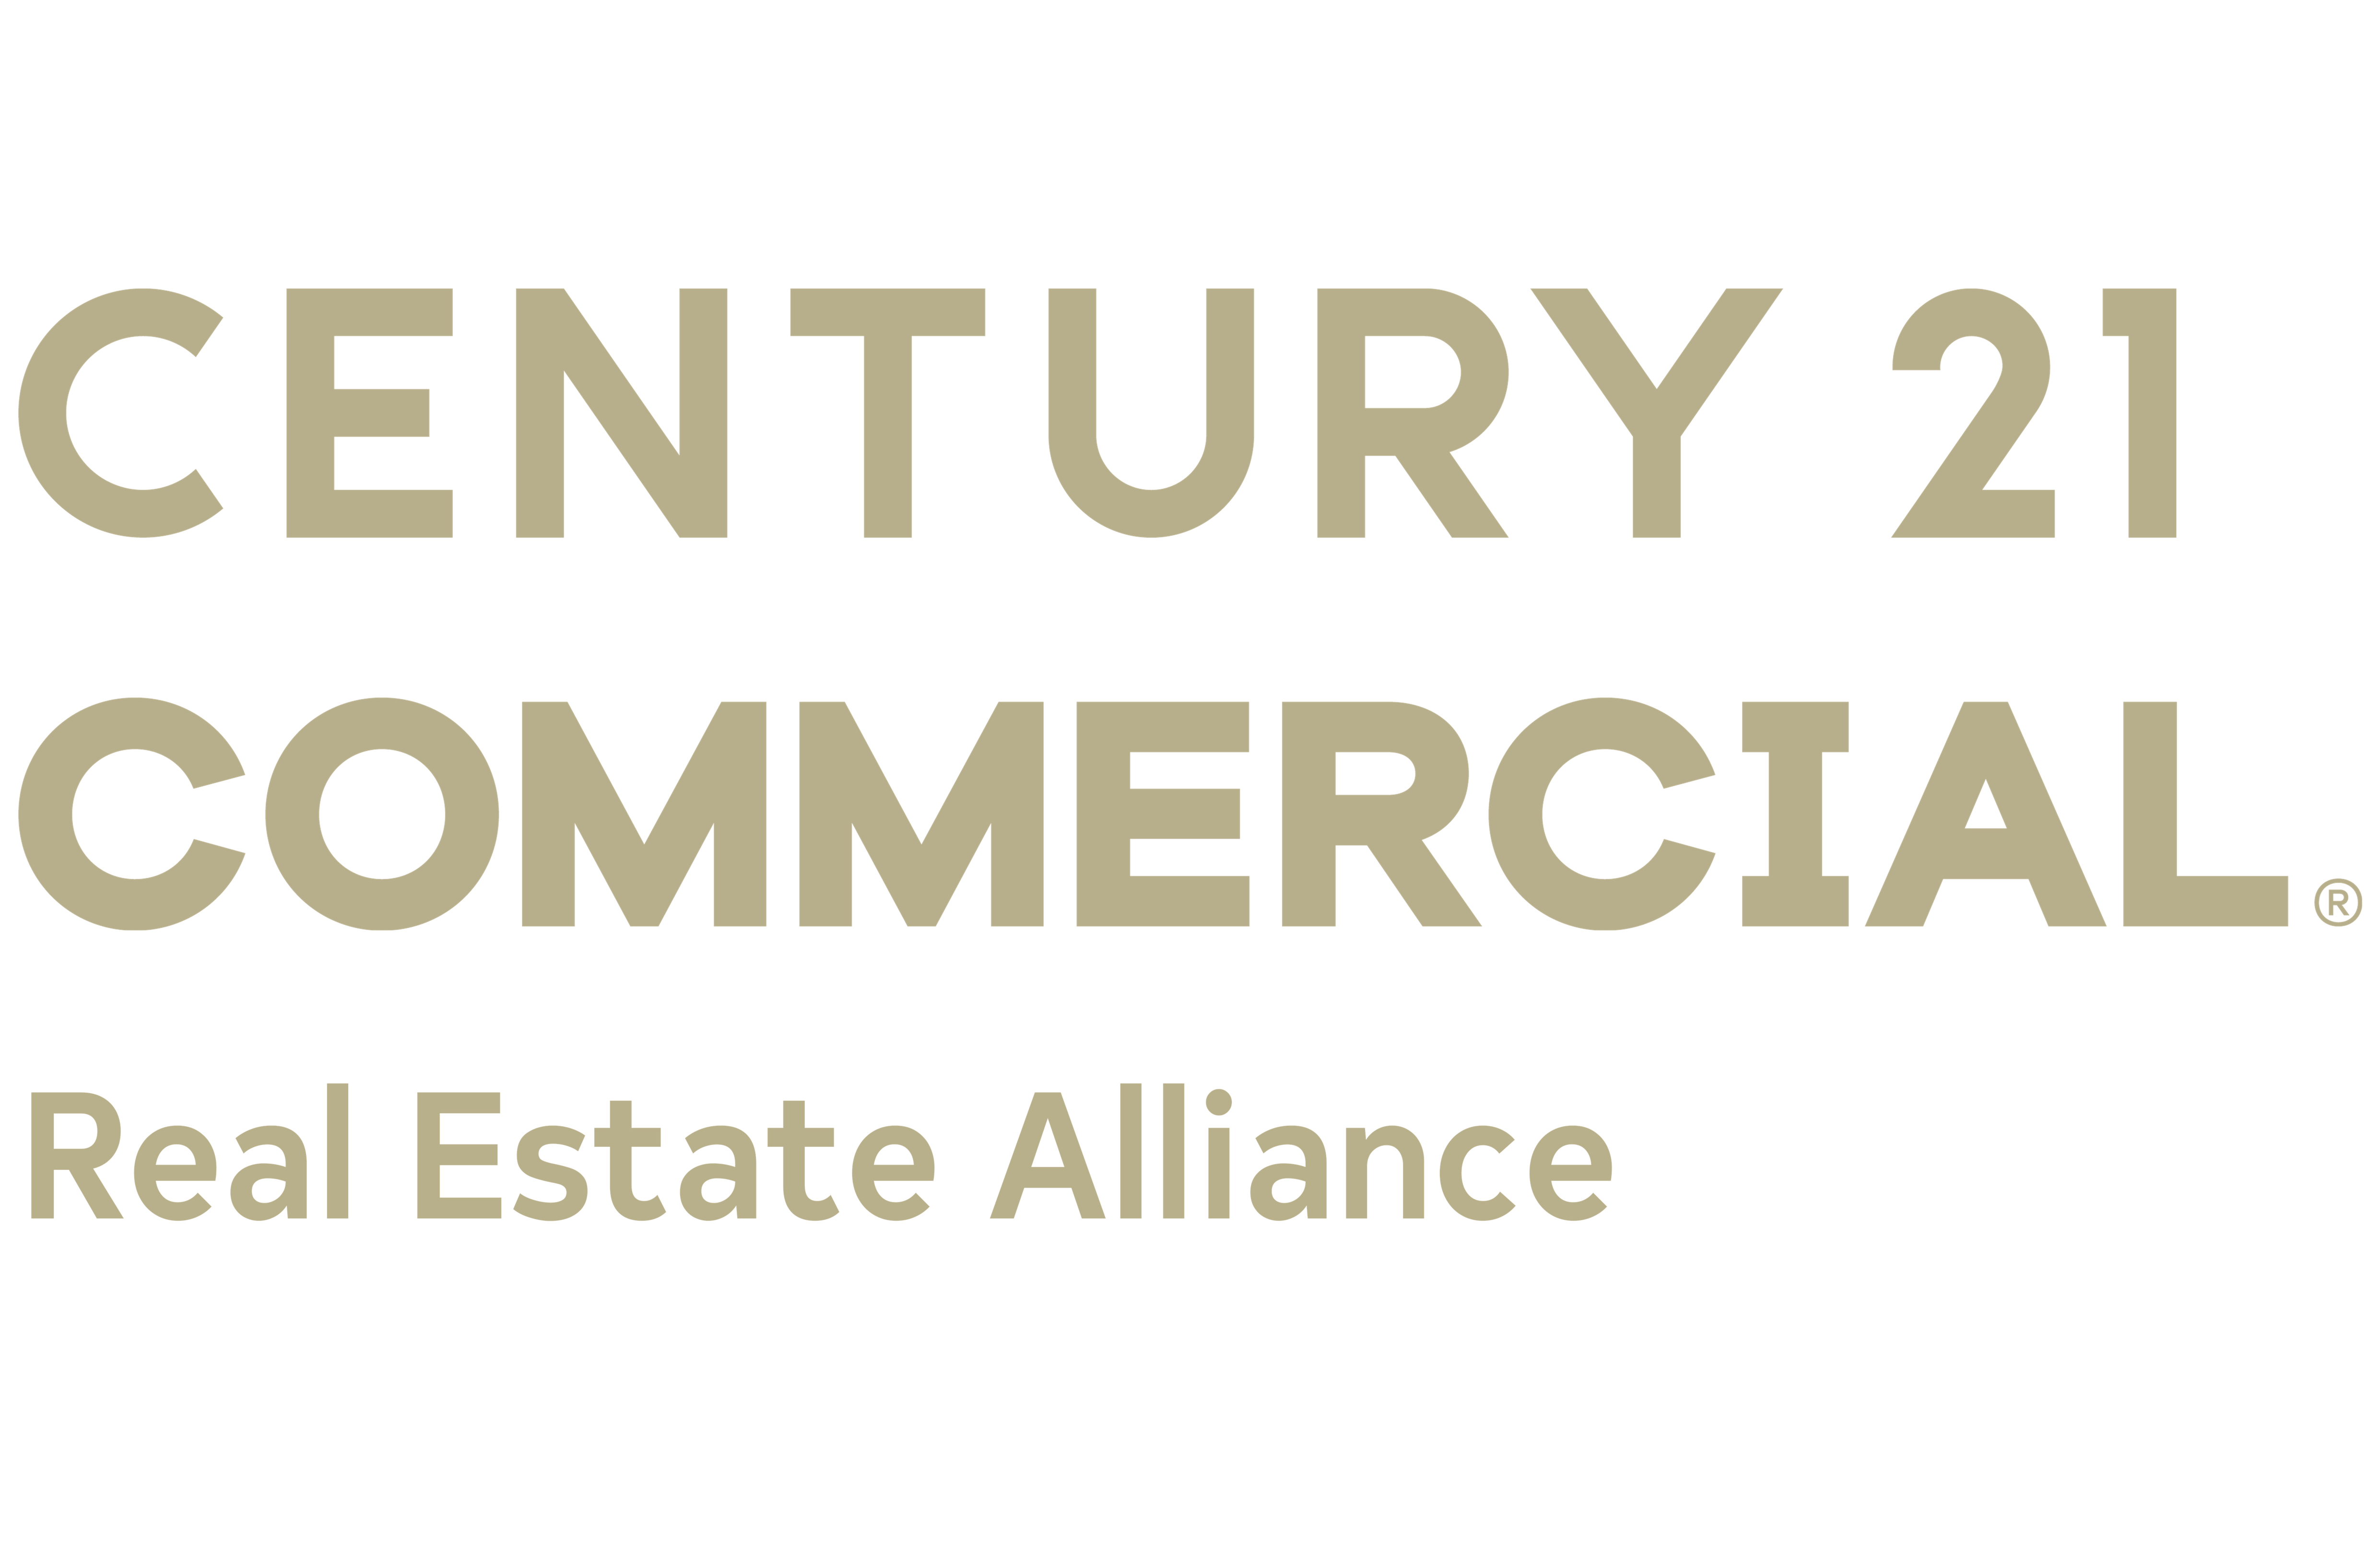 Real Estate Alliance Team of CENTURY 21 Real Estate Alliance logo